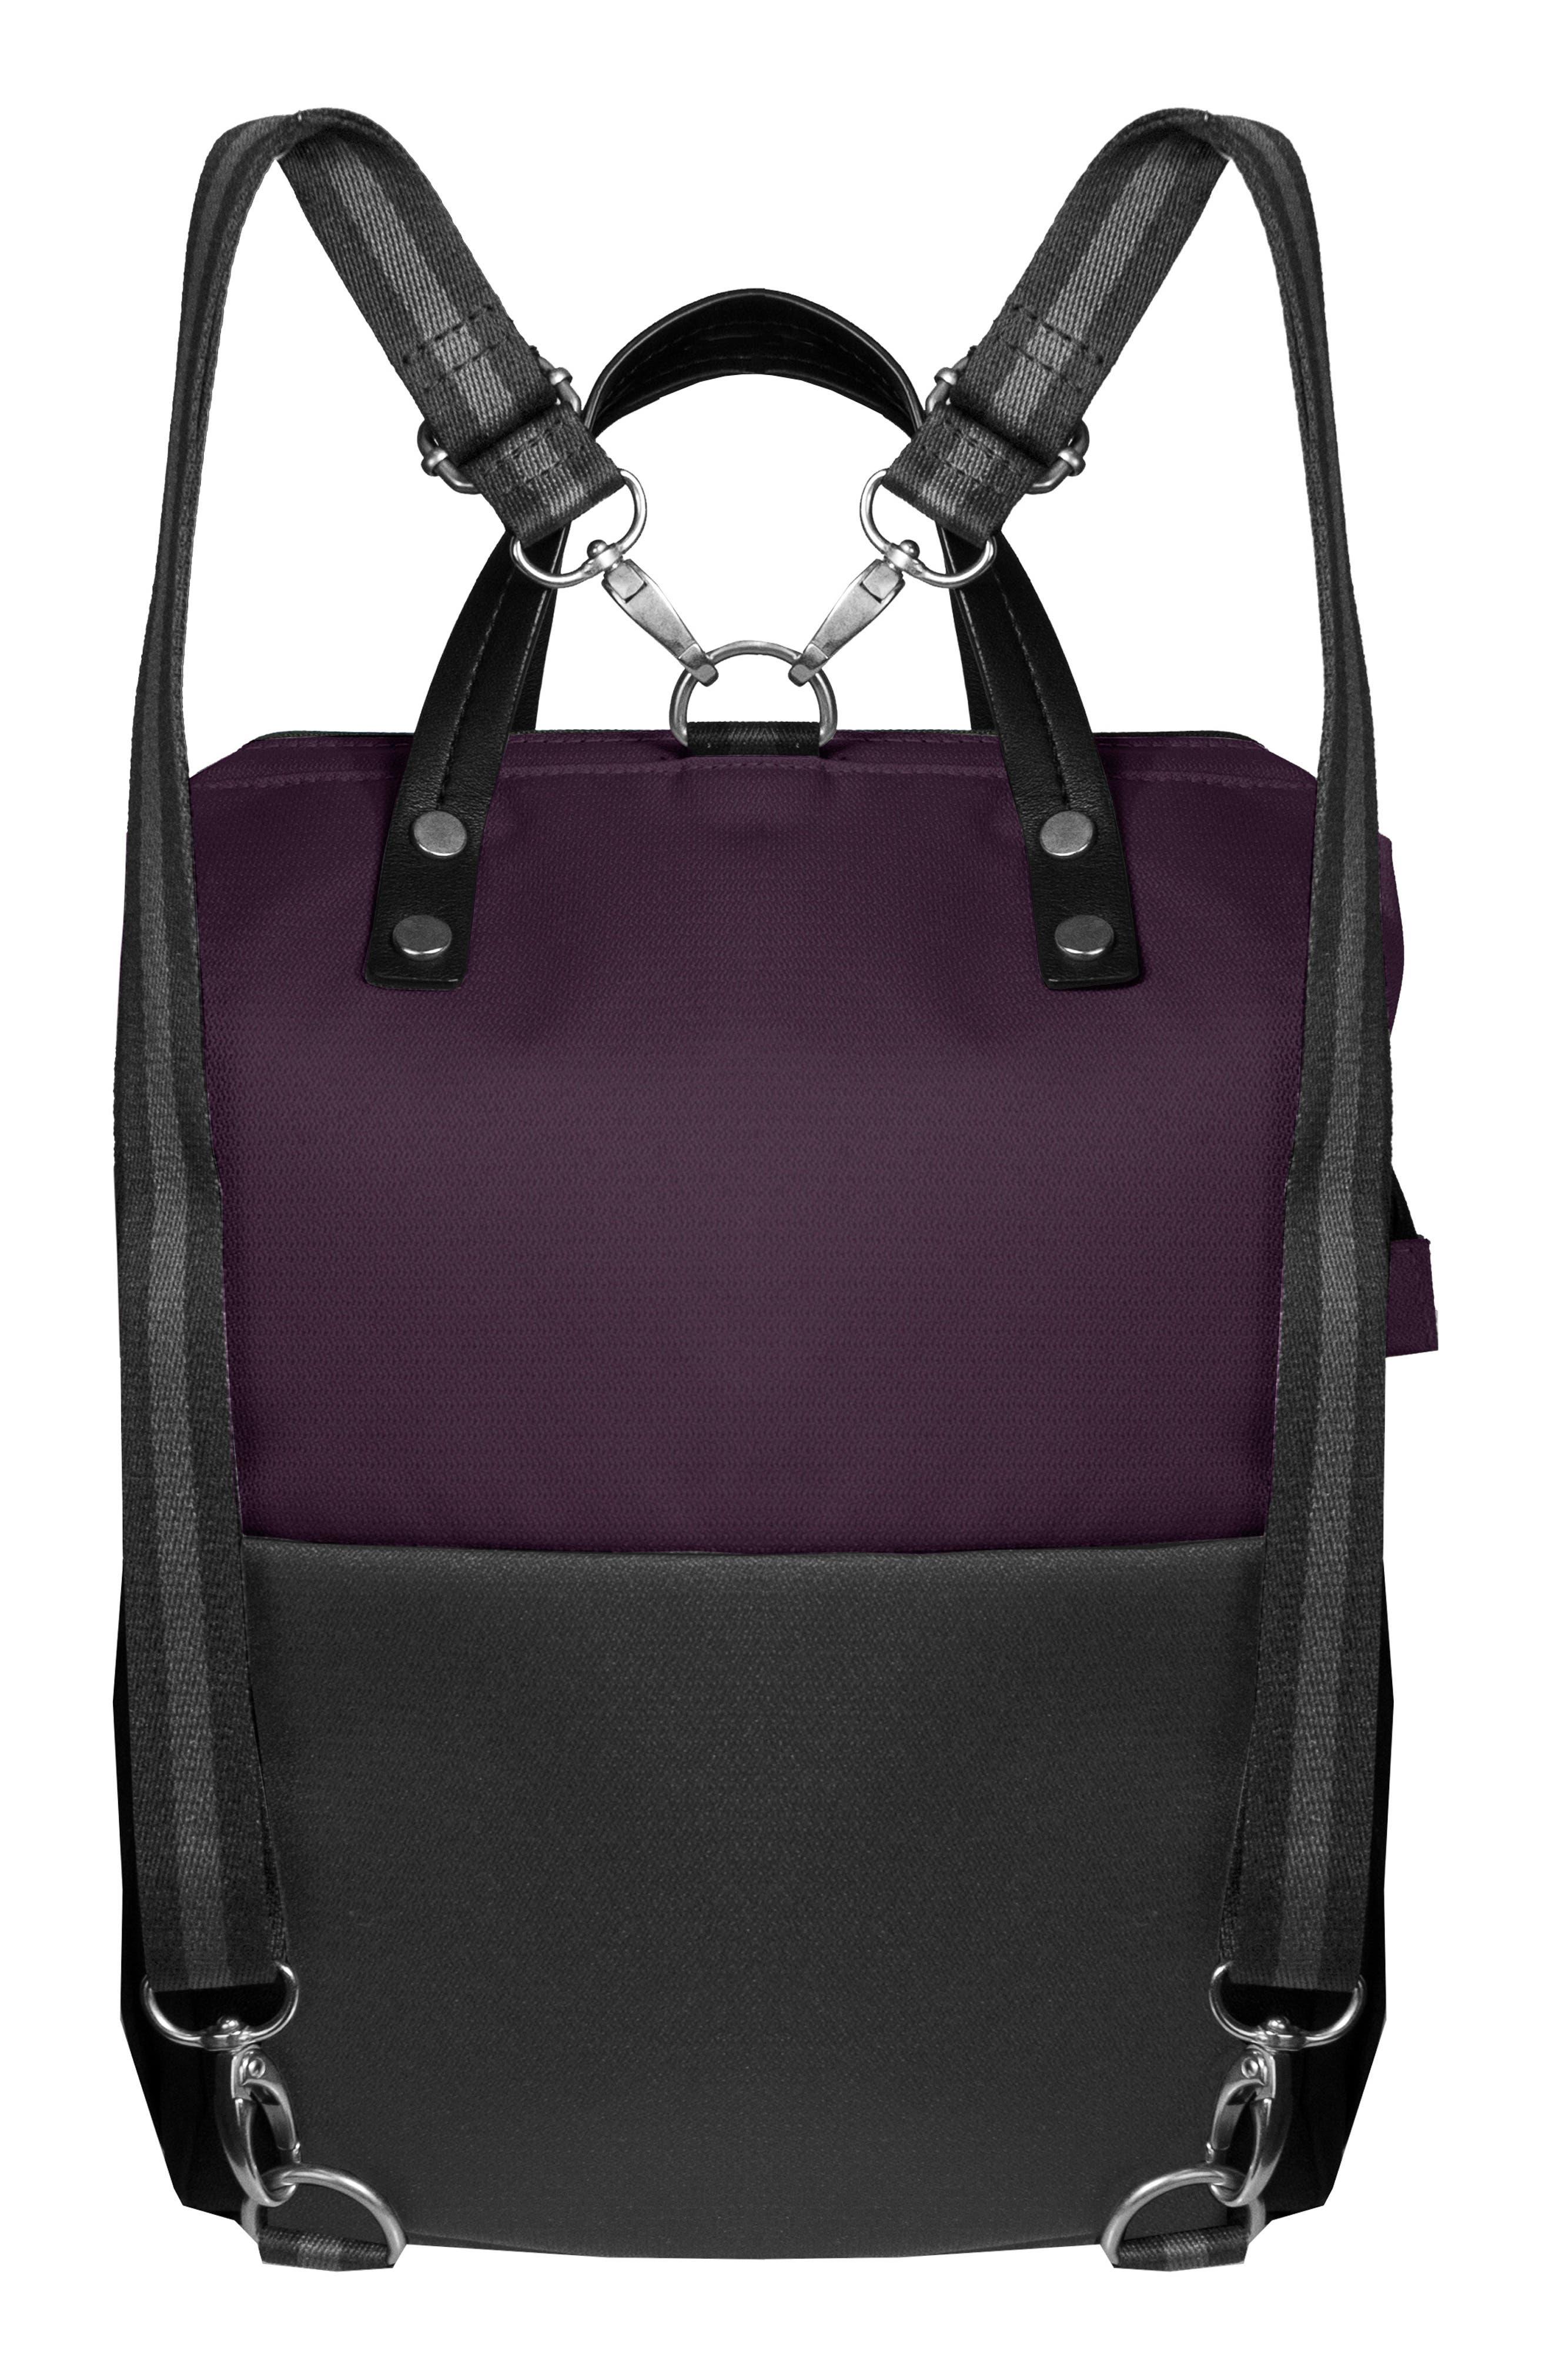 Dispatch Water Resistant RFID Pocket Convertible Backpack,                             Alternate thumbnail 2, color,                             DAHLIA/ FLINT